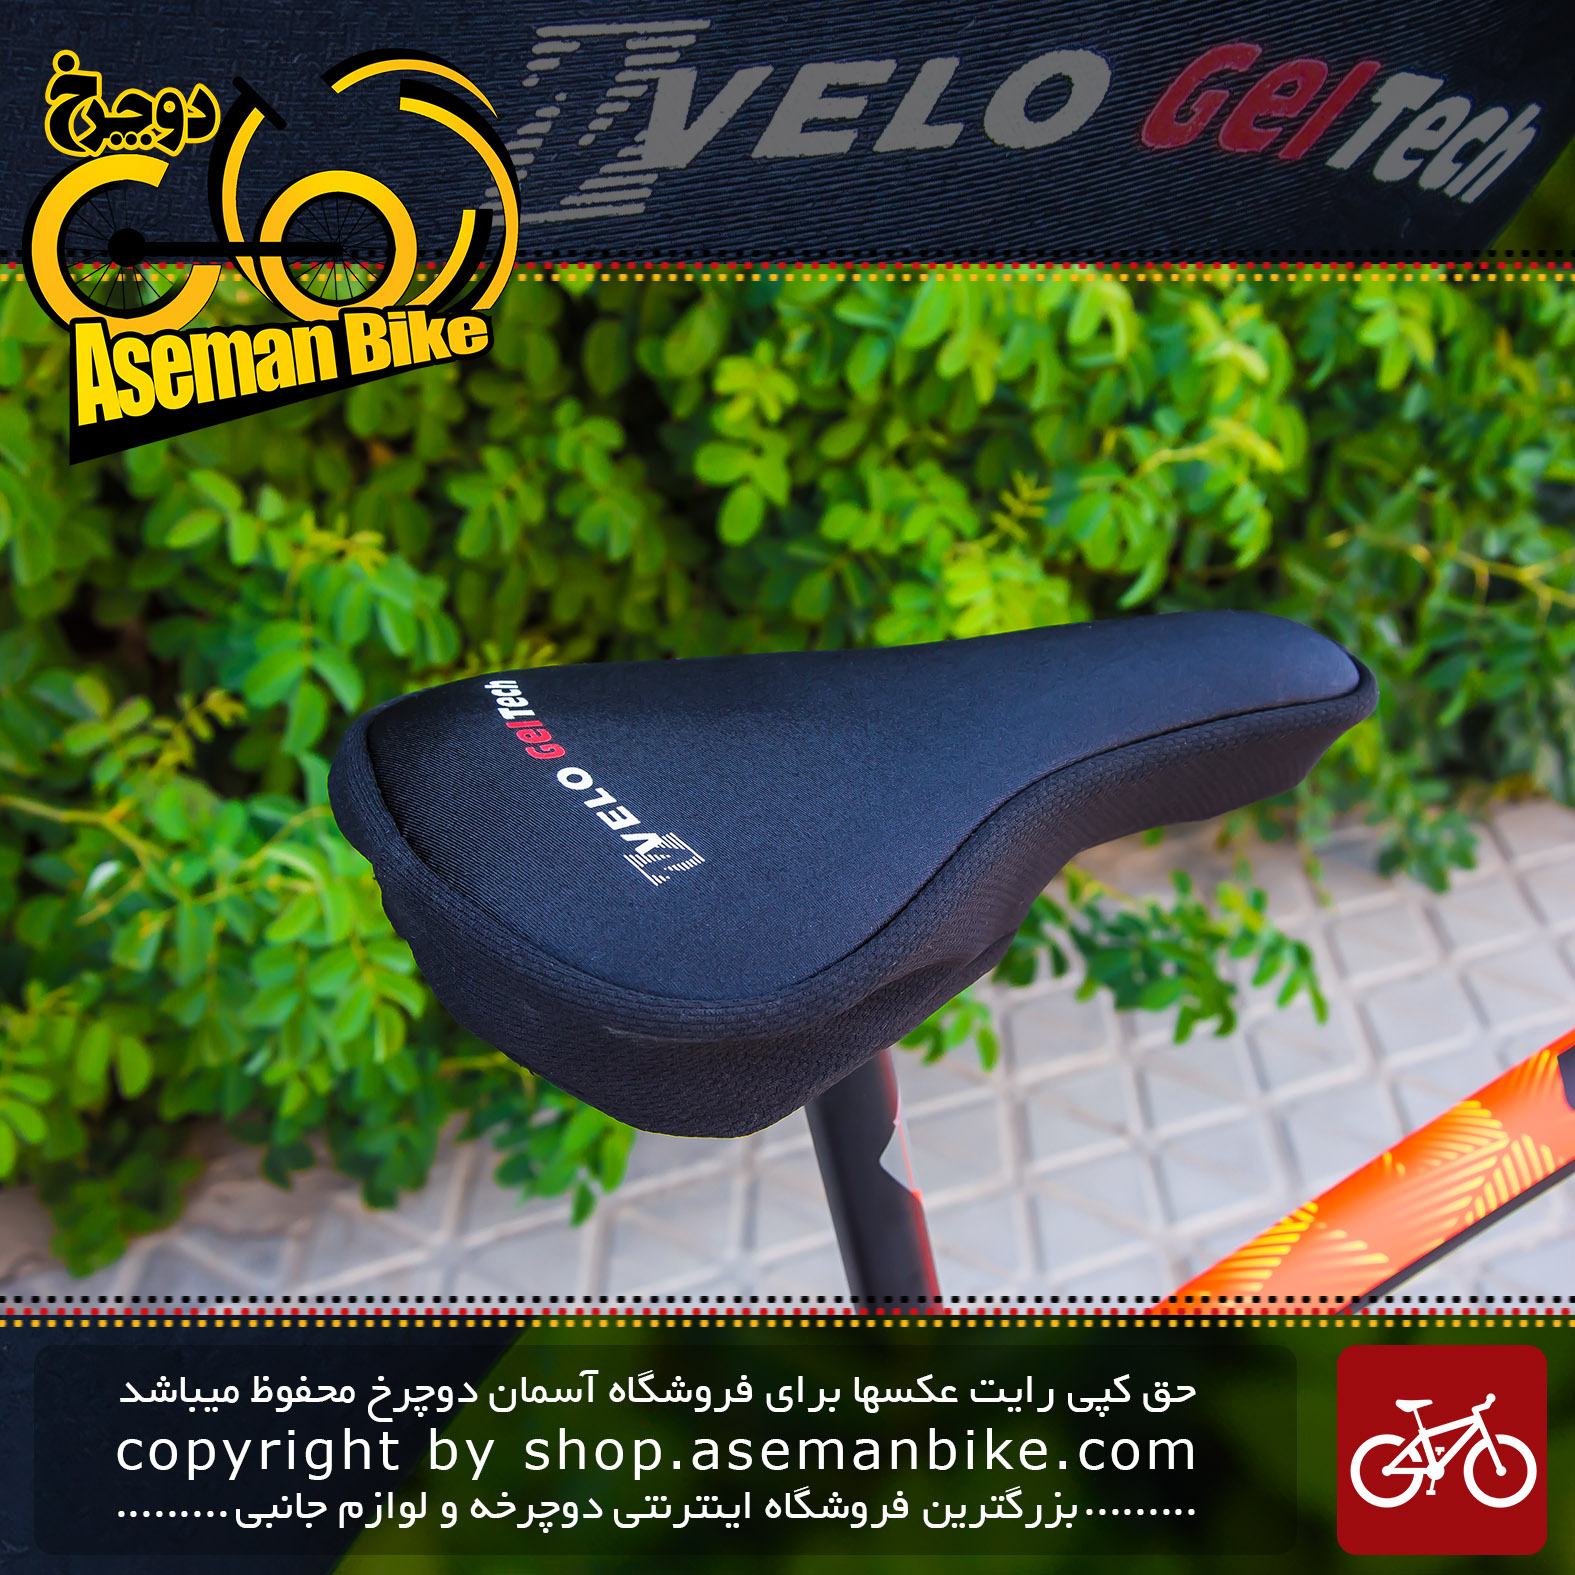 روکش زین دوچرخه ژله ای ولو Velo Gel Tech Bicycle Saddle Cover